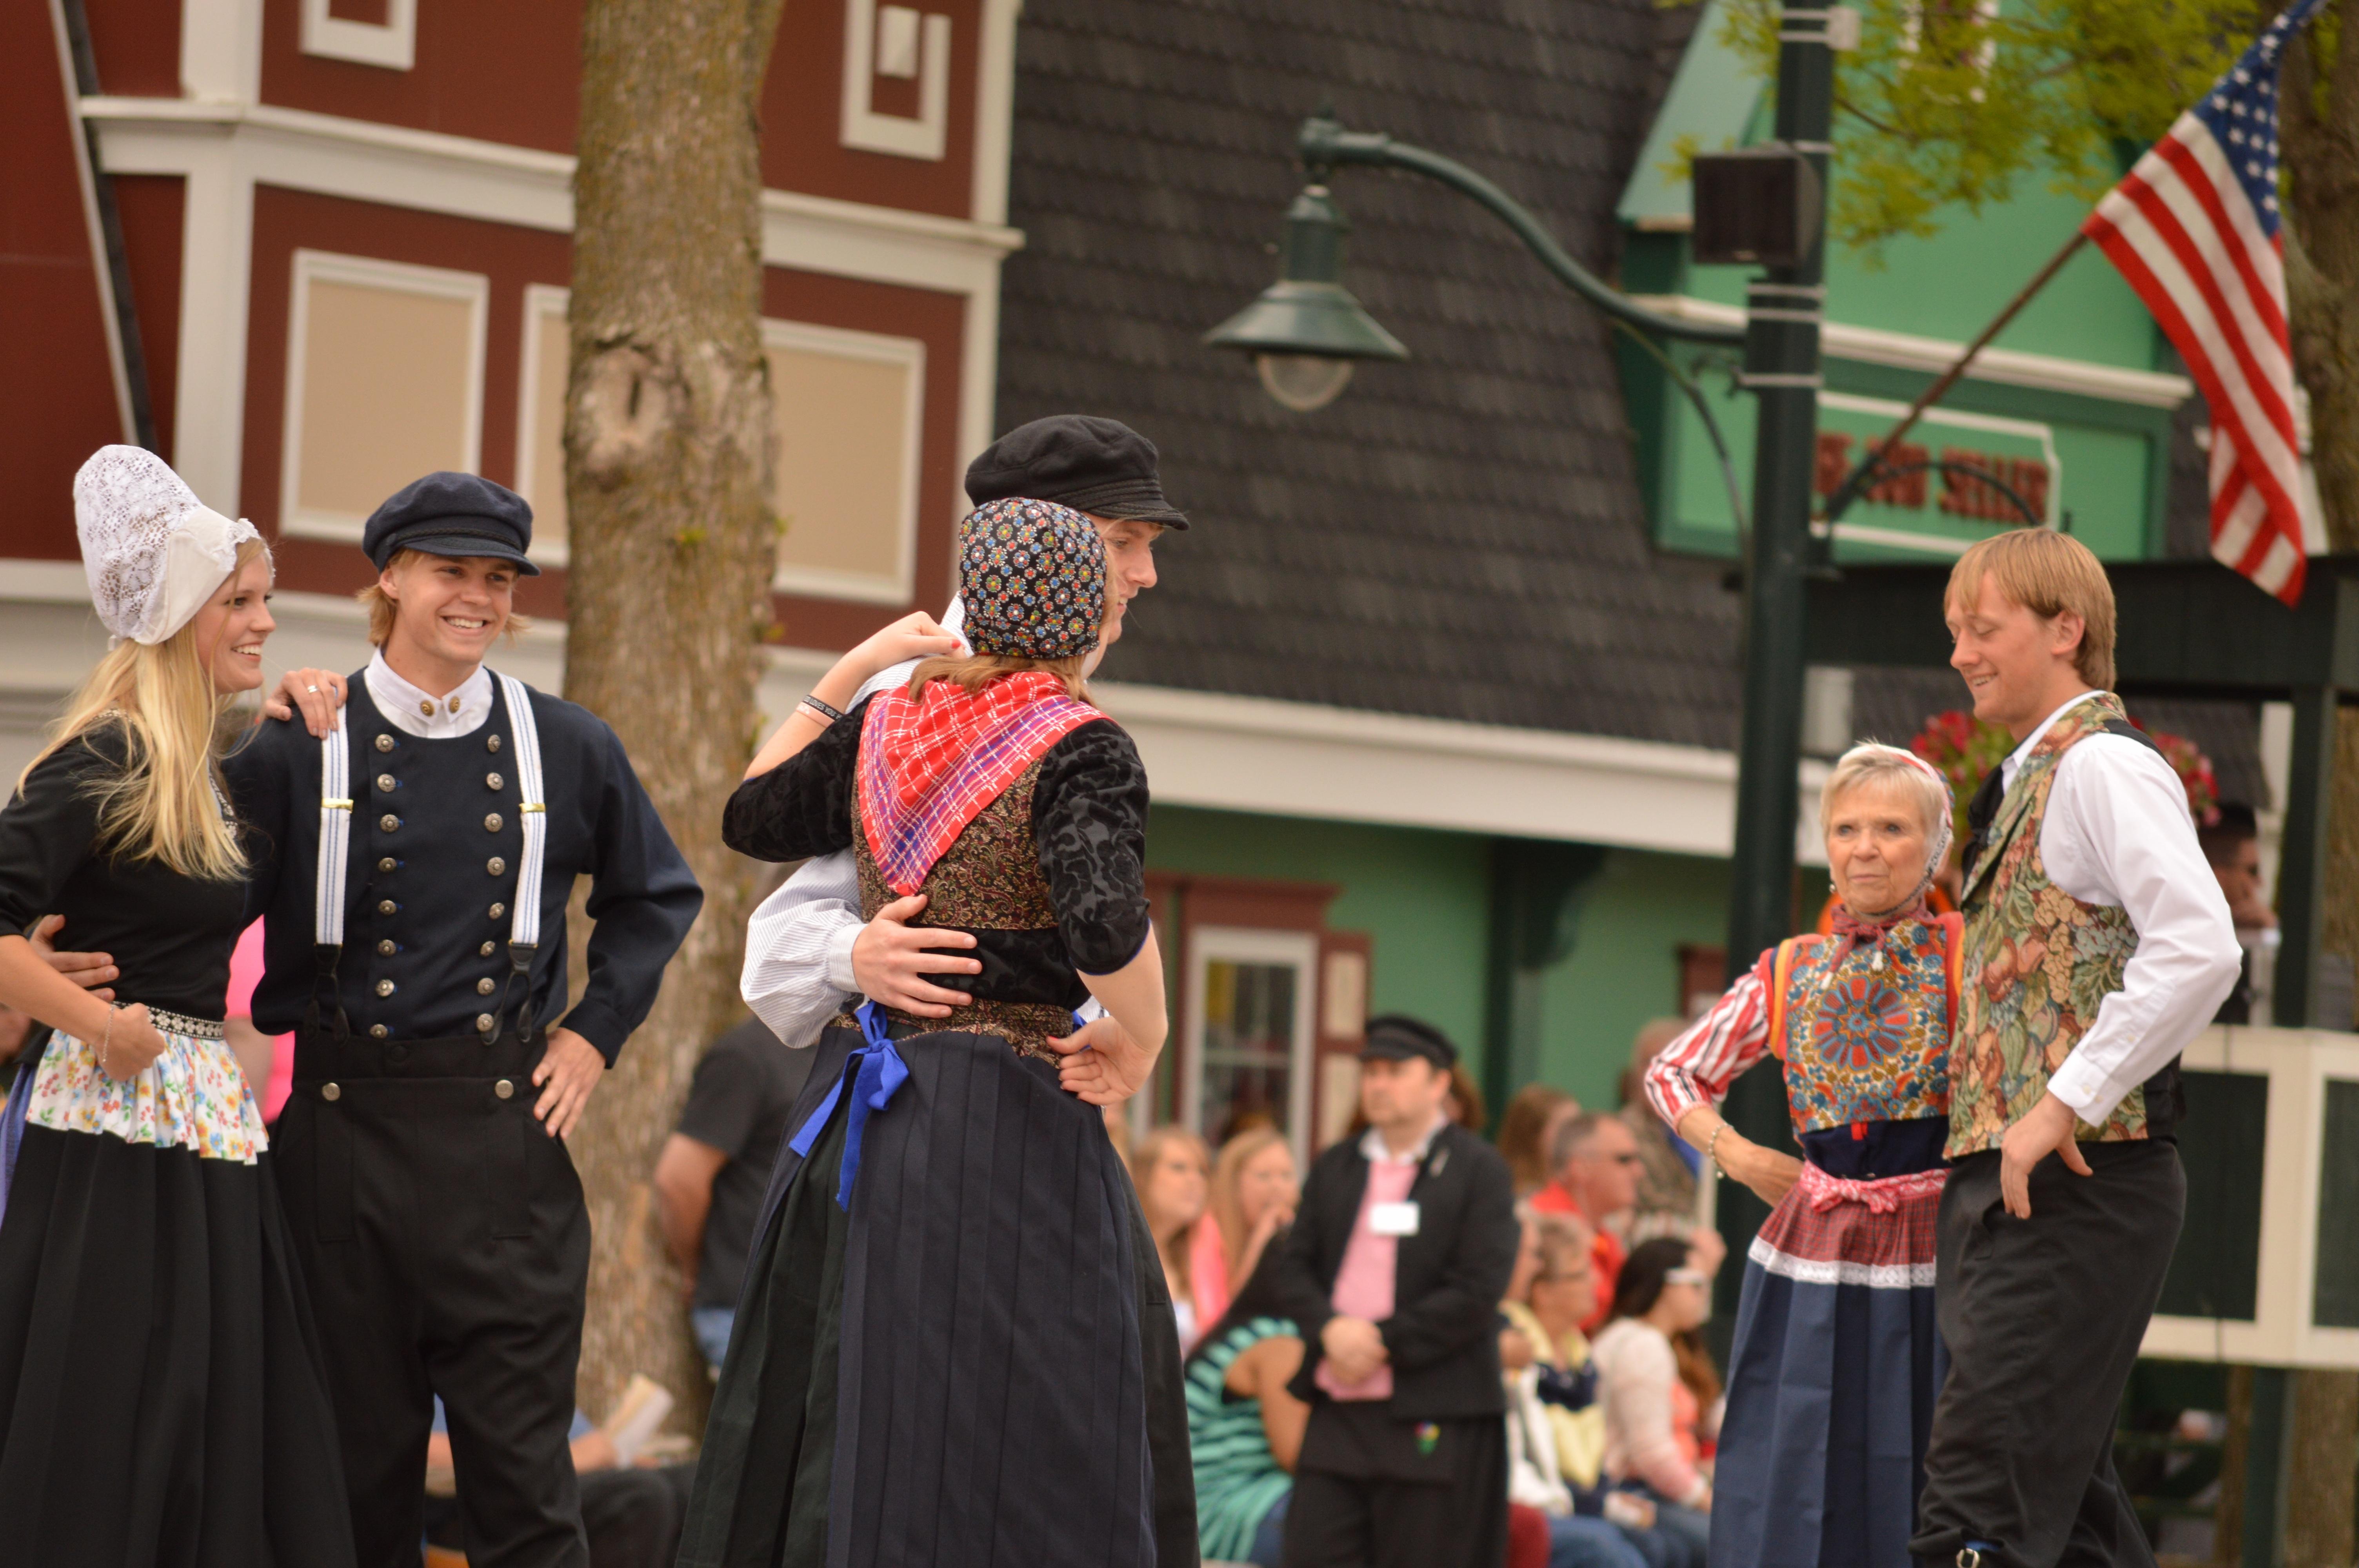 Free Images : usa, america, parade, ethnic, holland